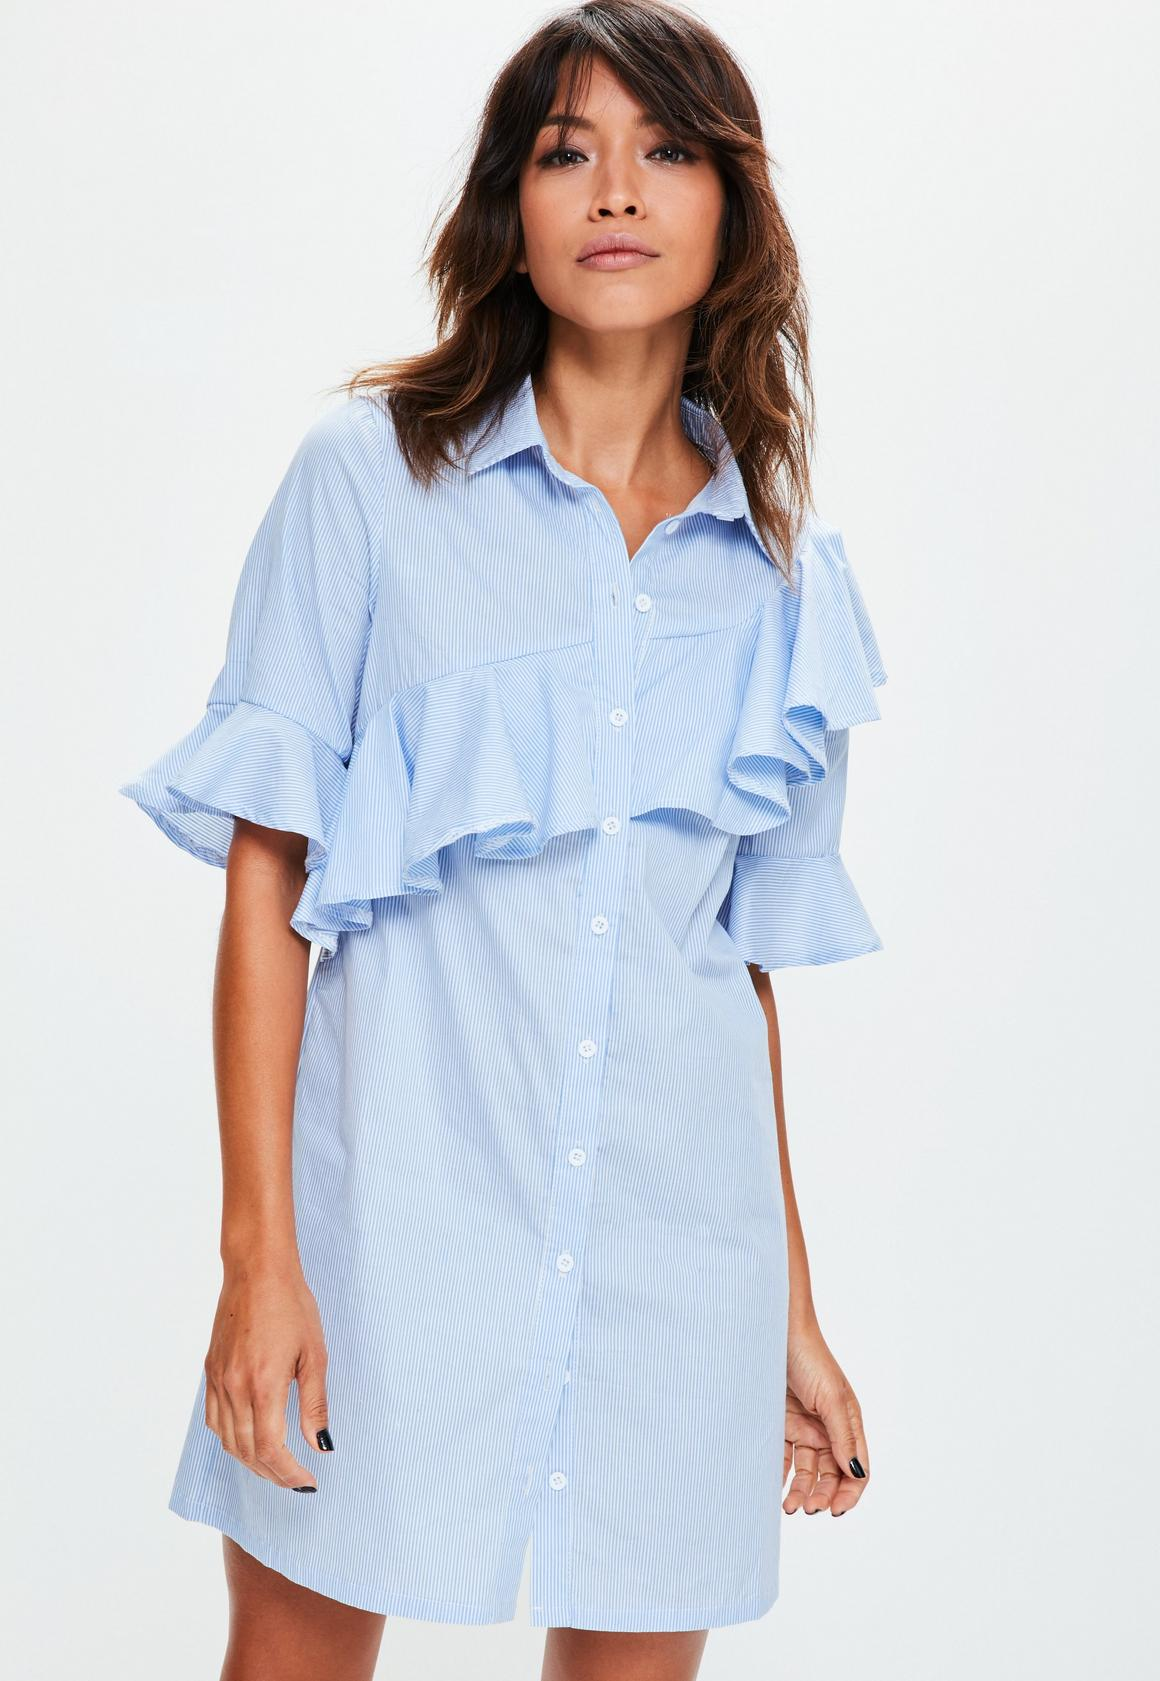 Blue Striped Ruffle Short Sleeve Shirt Dress | Missguided Ireland